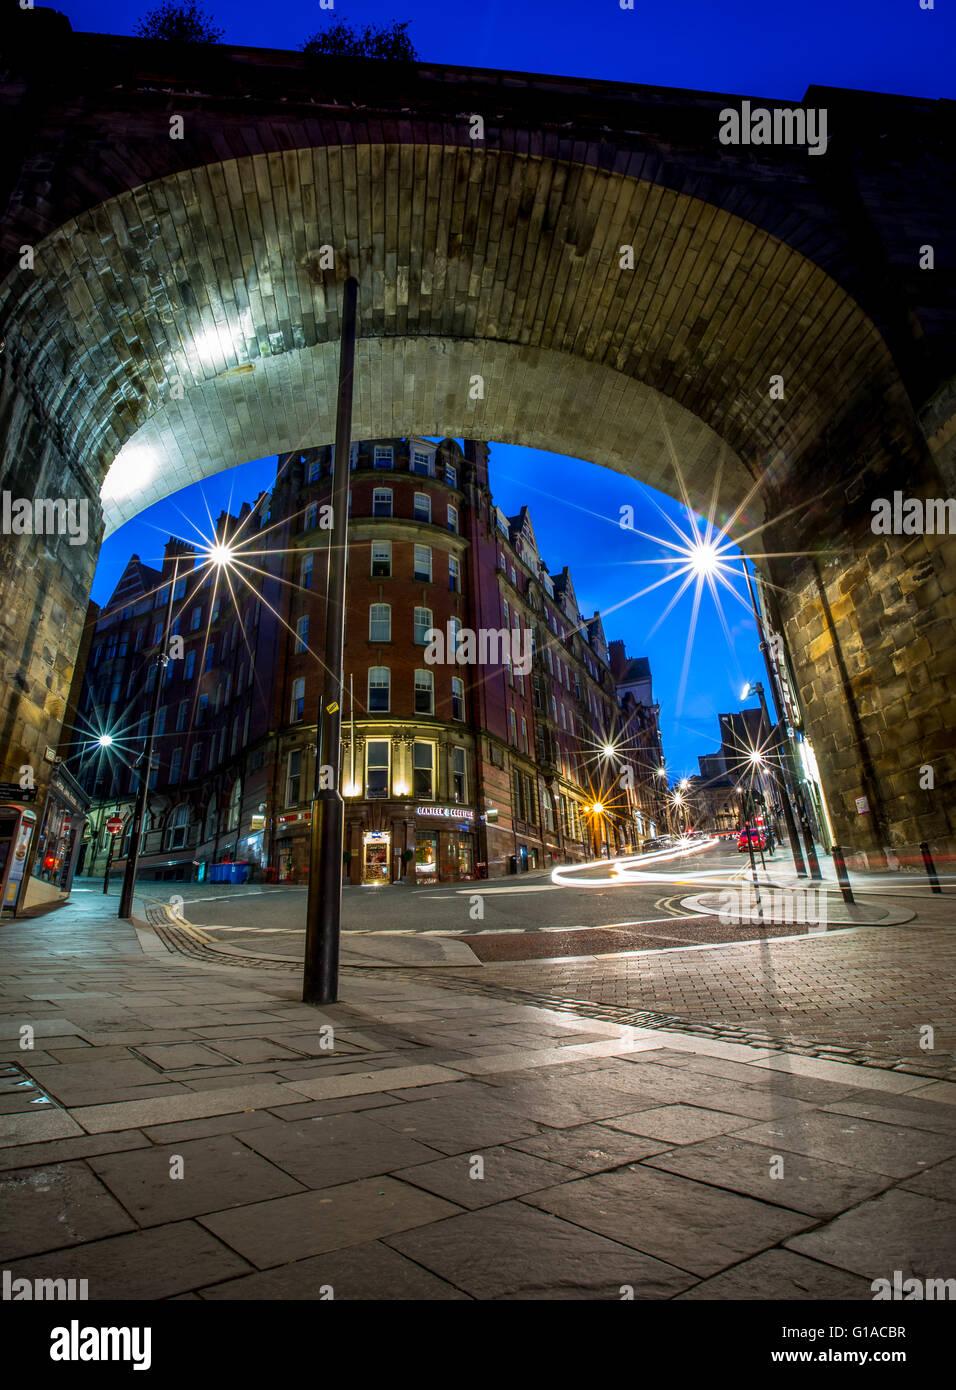 Dean Street at night, Newcastle upon Tyne. - Stock Image